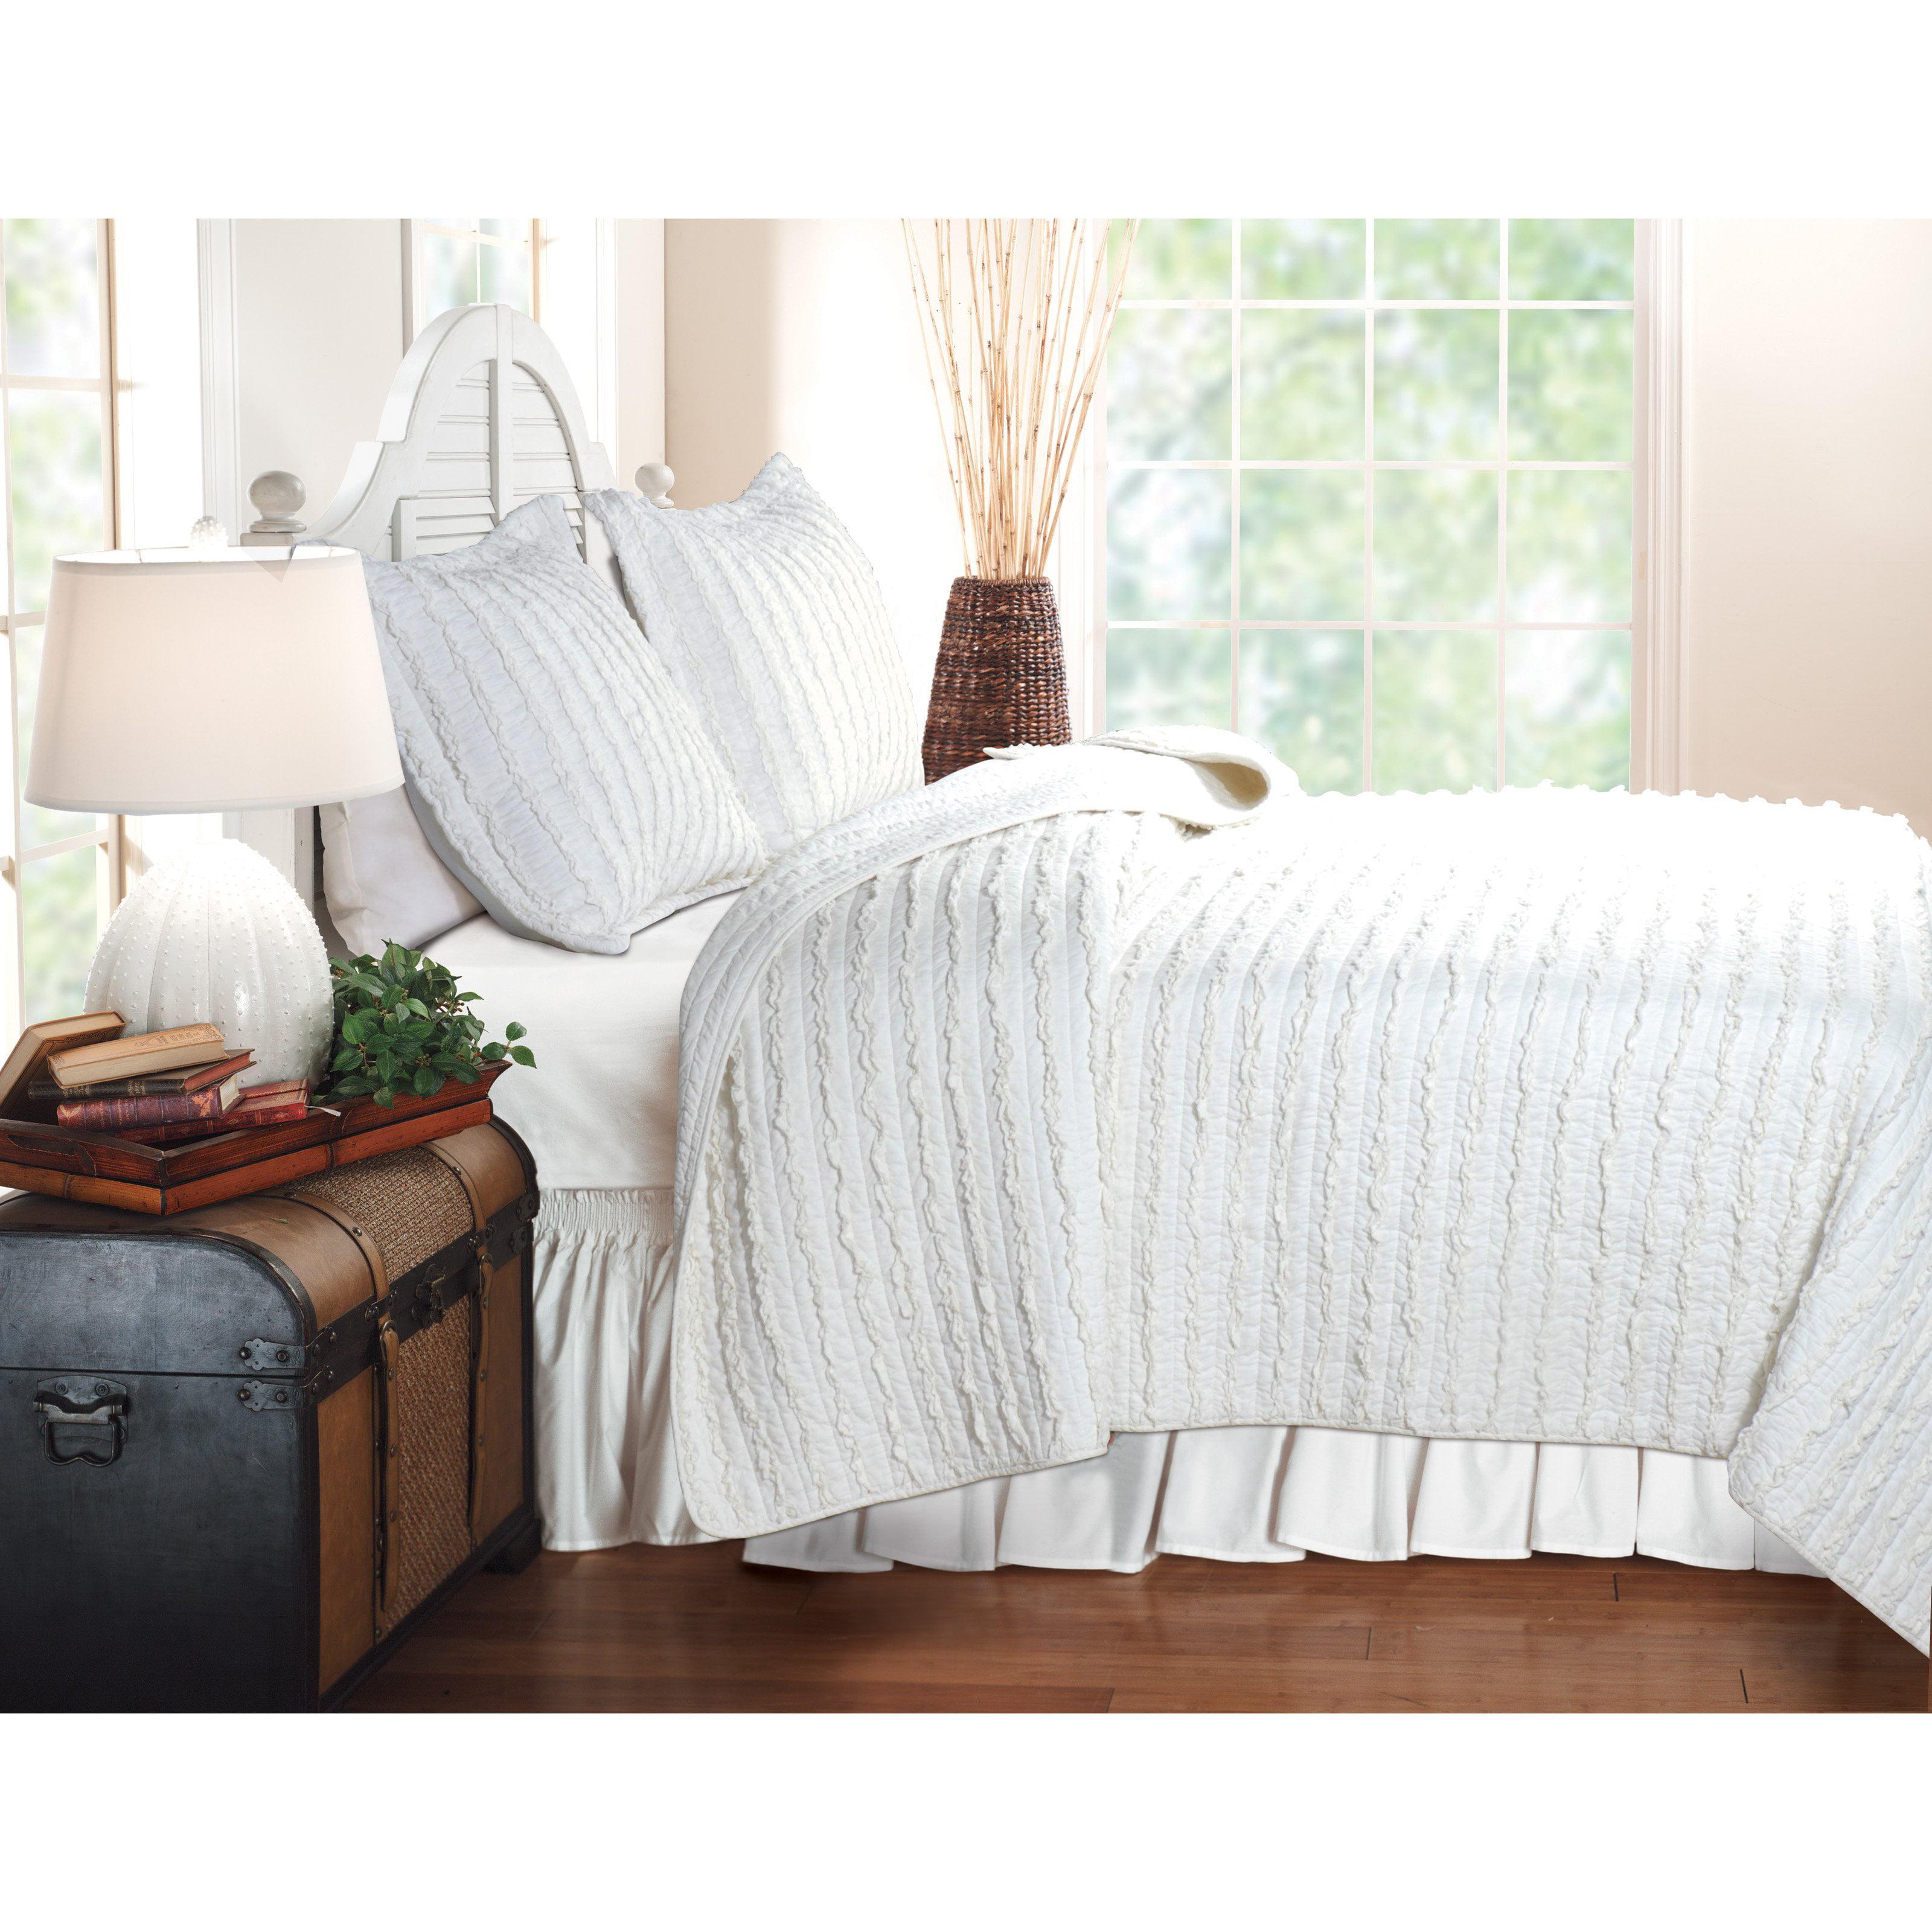 Twin white ruffle bedding - Greenland Home Fashions Ruffled 2 Piece Quilt Set White Walmart Com